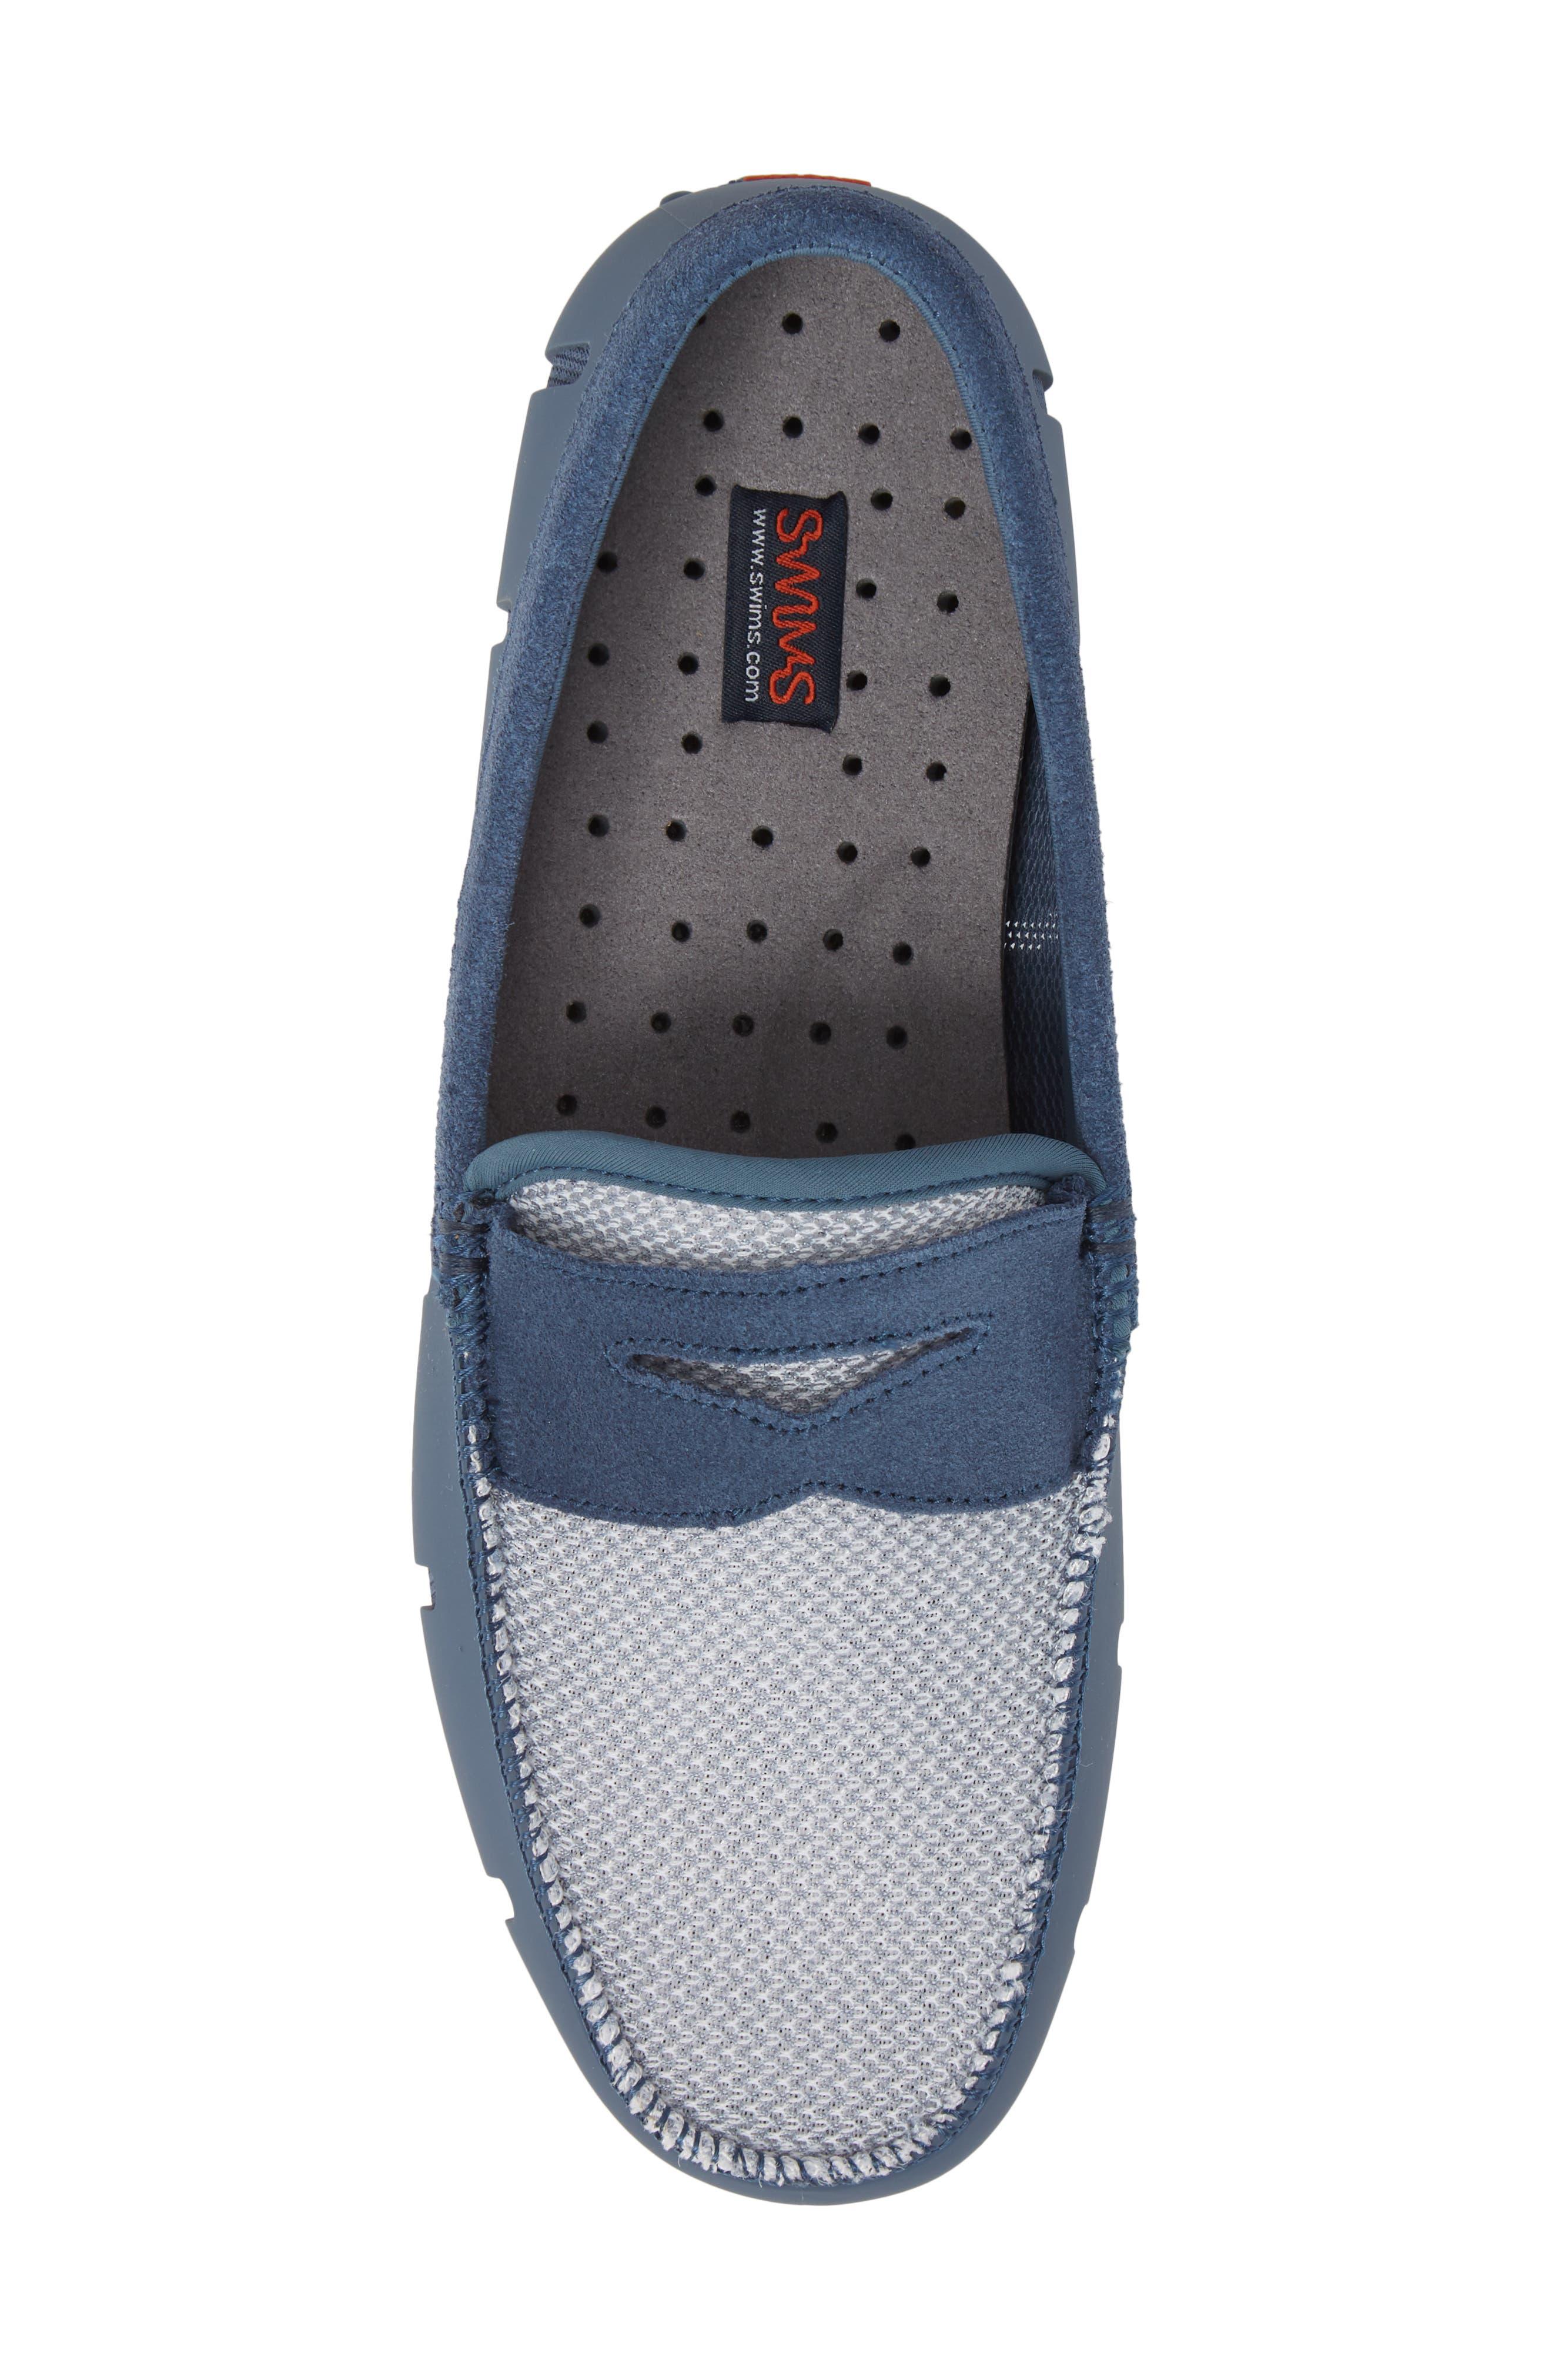 Driving Shoe,                             Alternate thumbnail 5, color,                             SLATE/ WHITE FABRIC